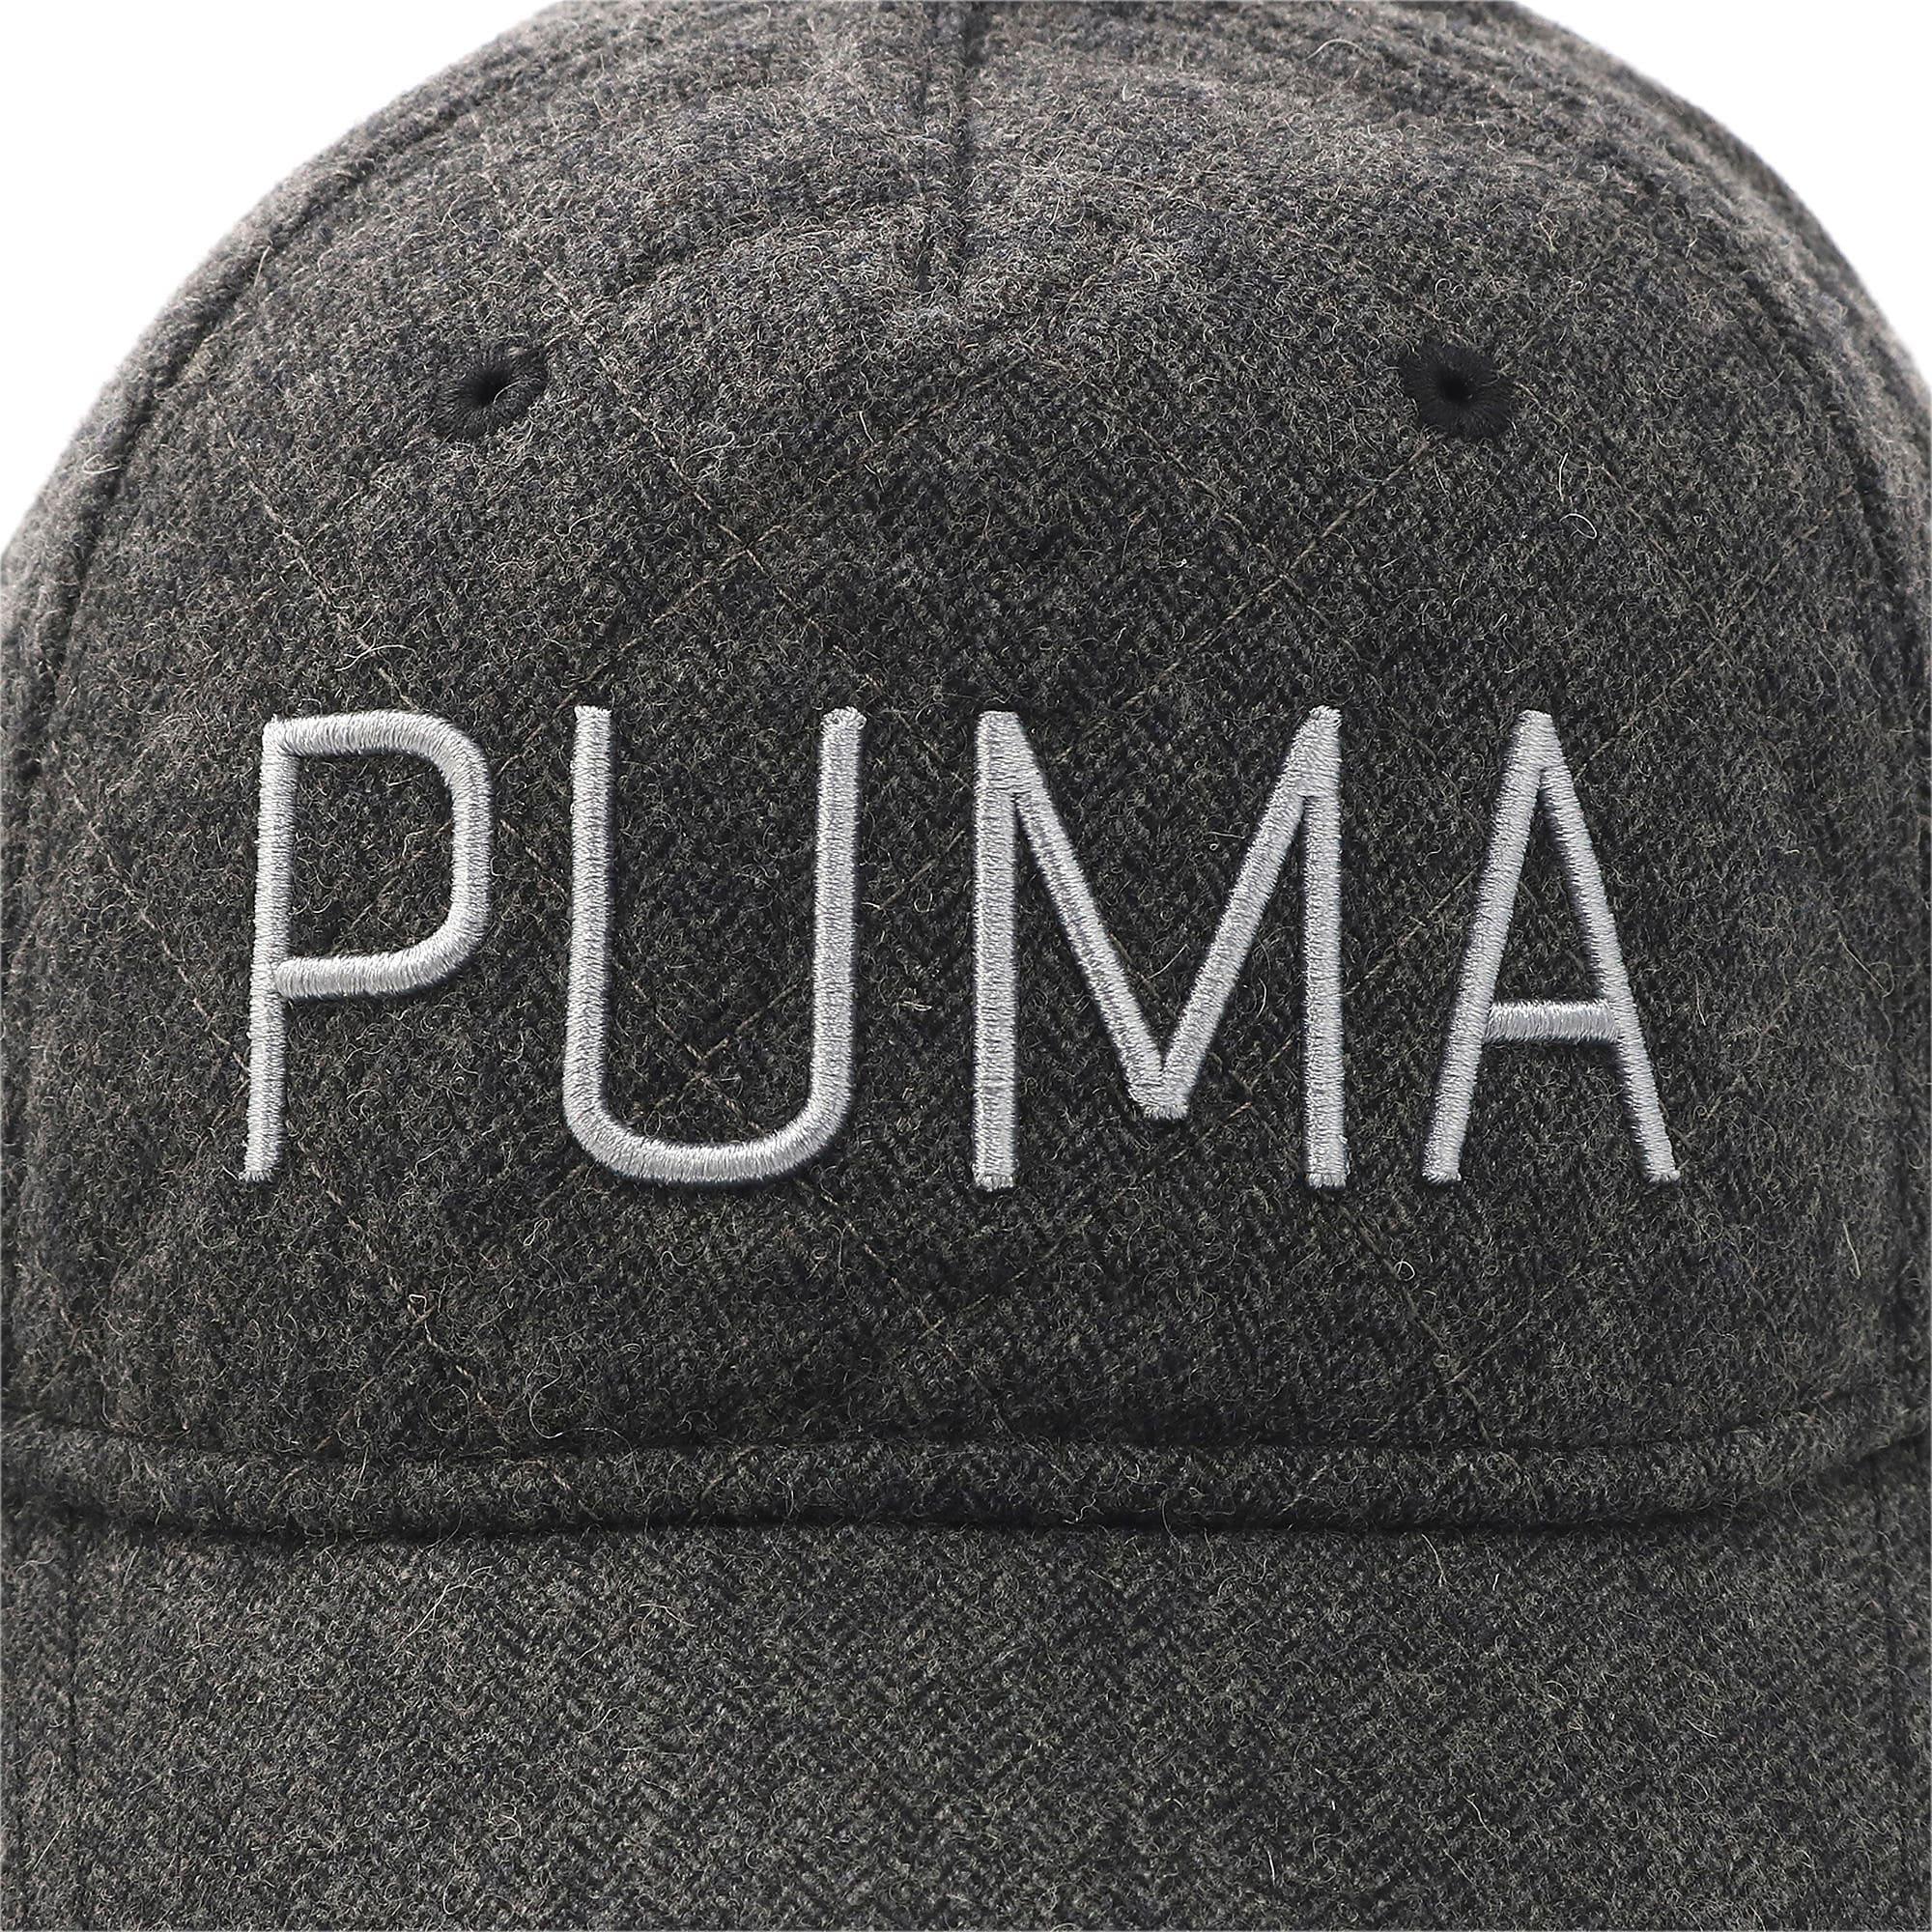 Thumbnail 5 of ゴルフ キルト キャップ, Puma Black, medium-JPN